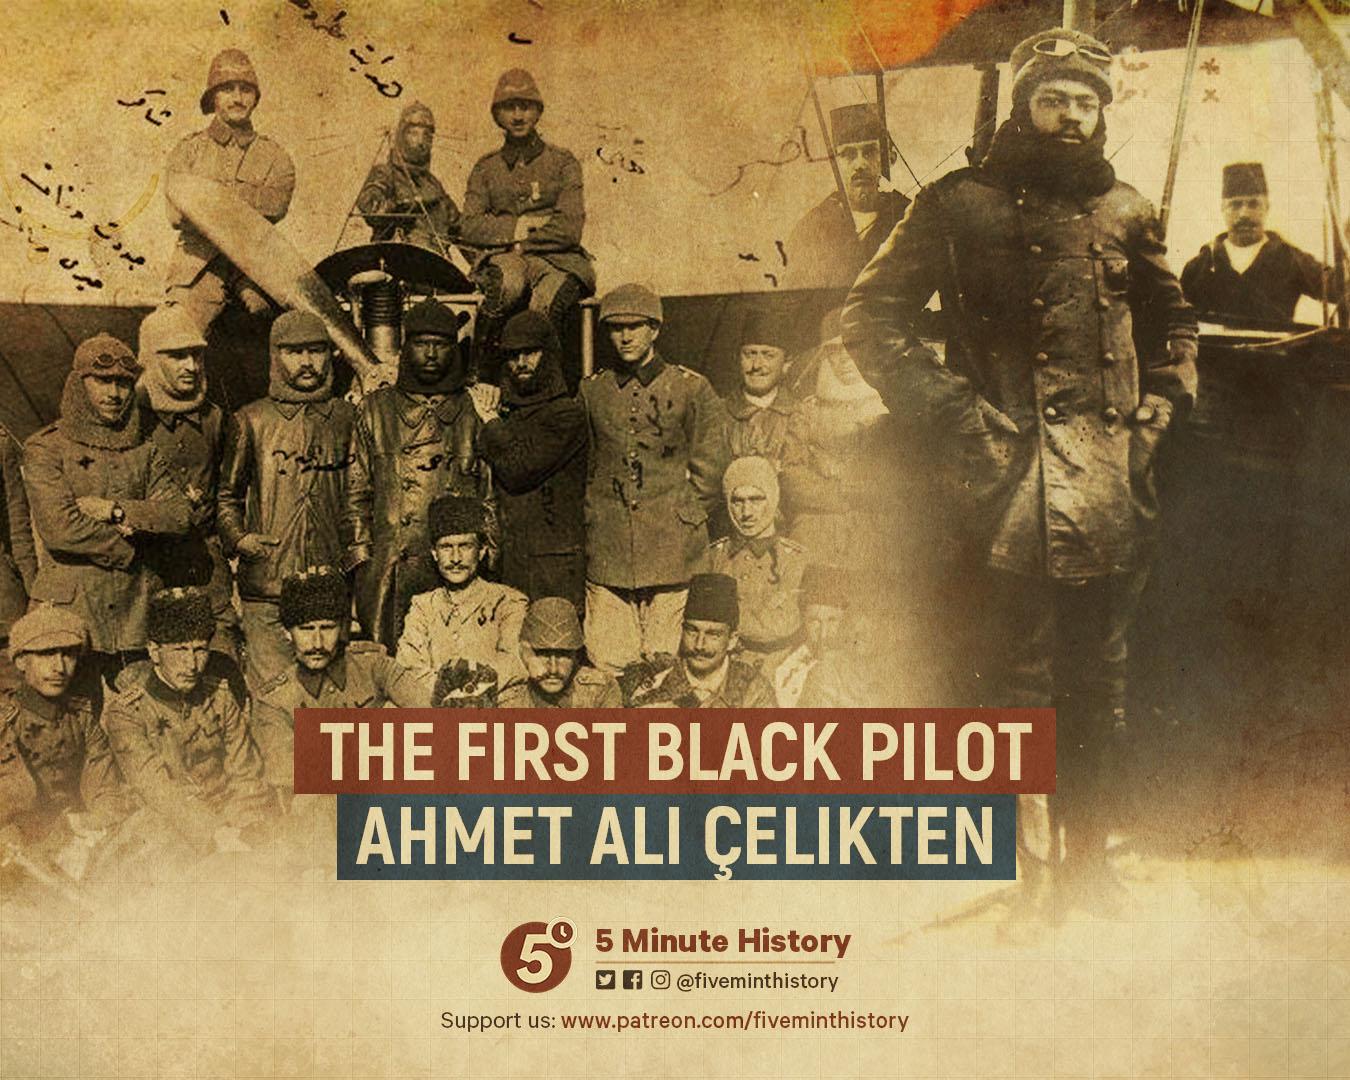 Ahmet Ali Çelikten The First Black Pilot